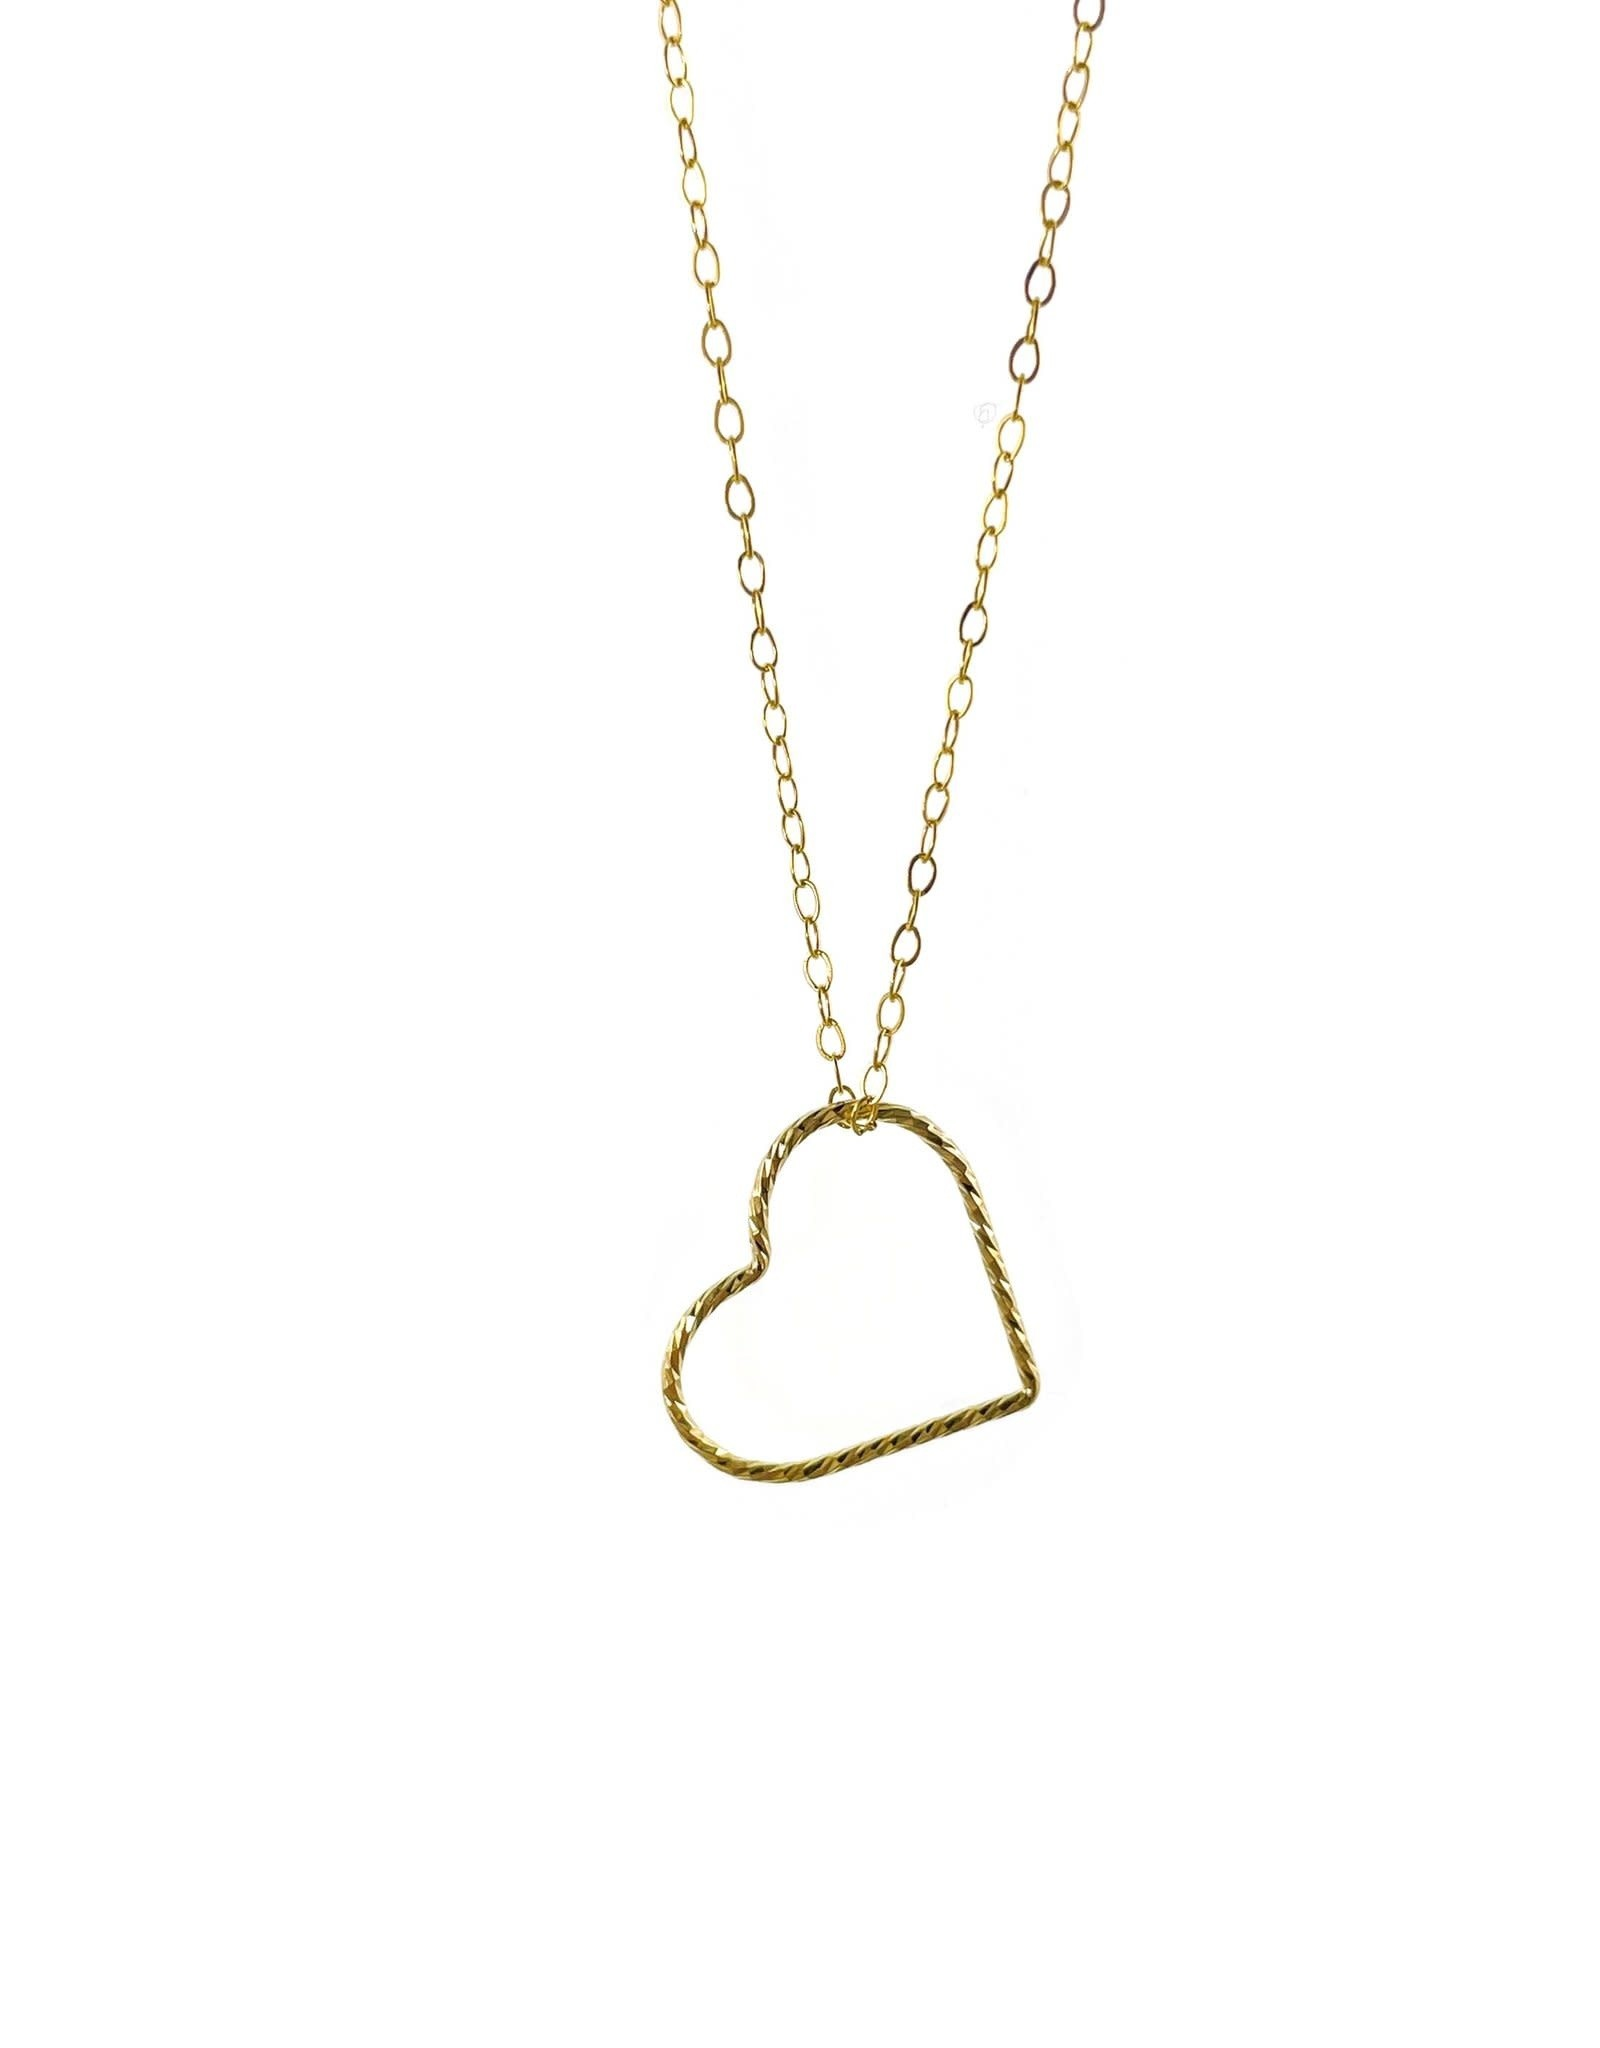 Collier 16'' - Coeur doublé or